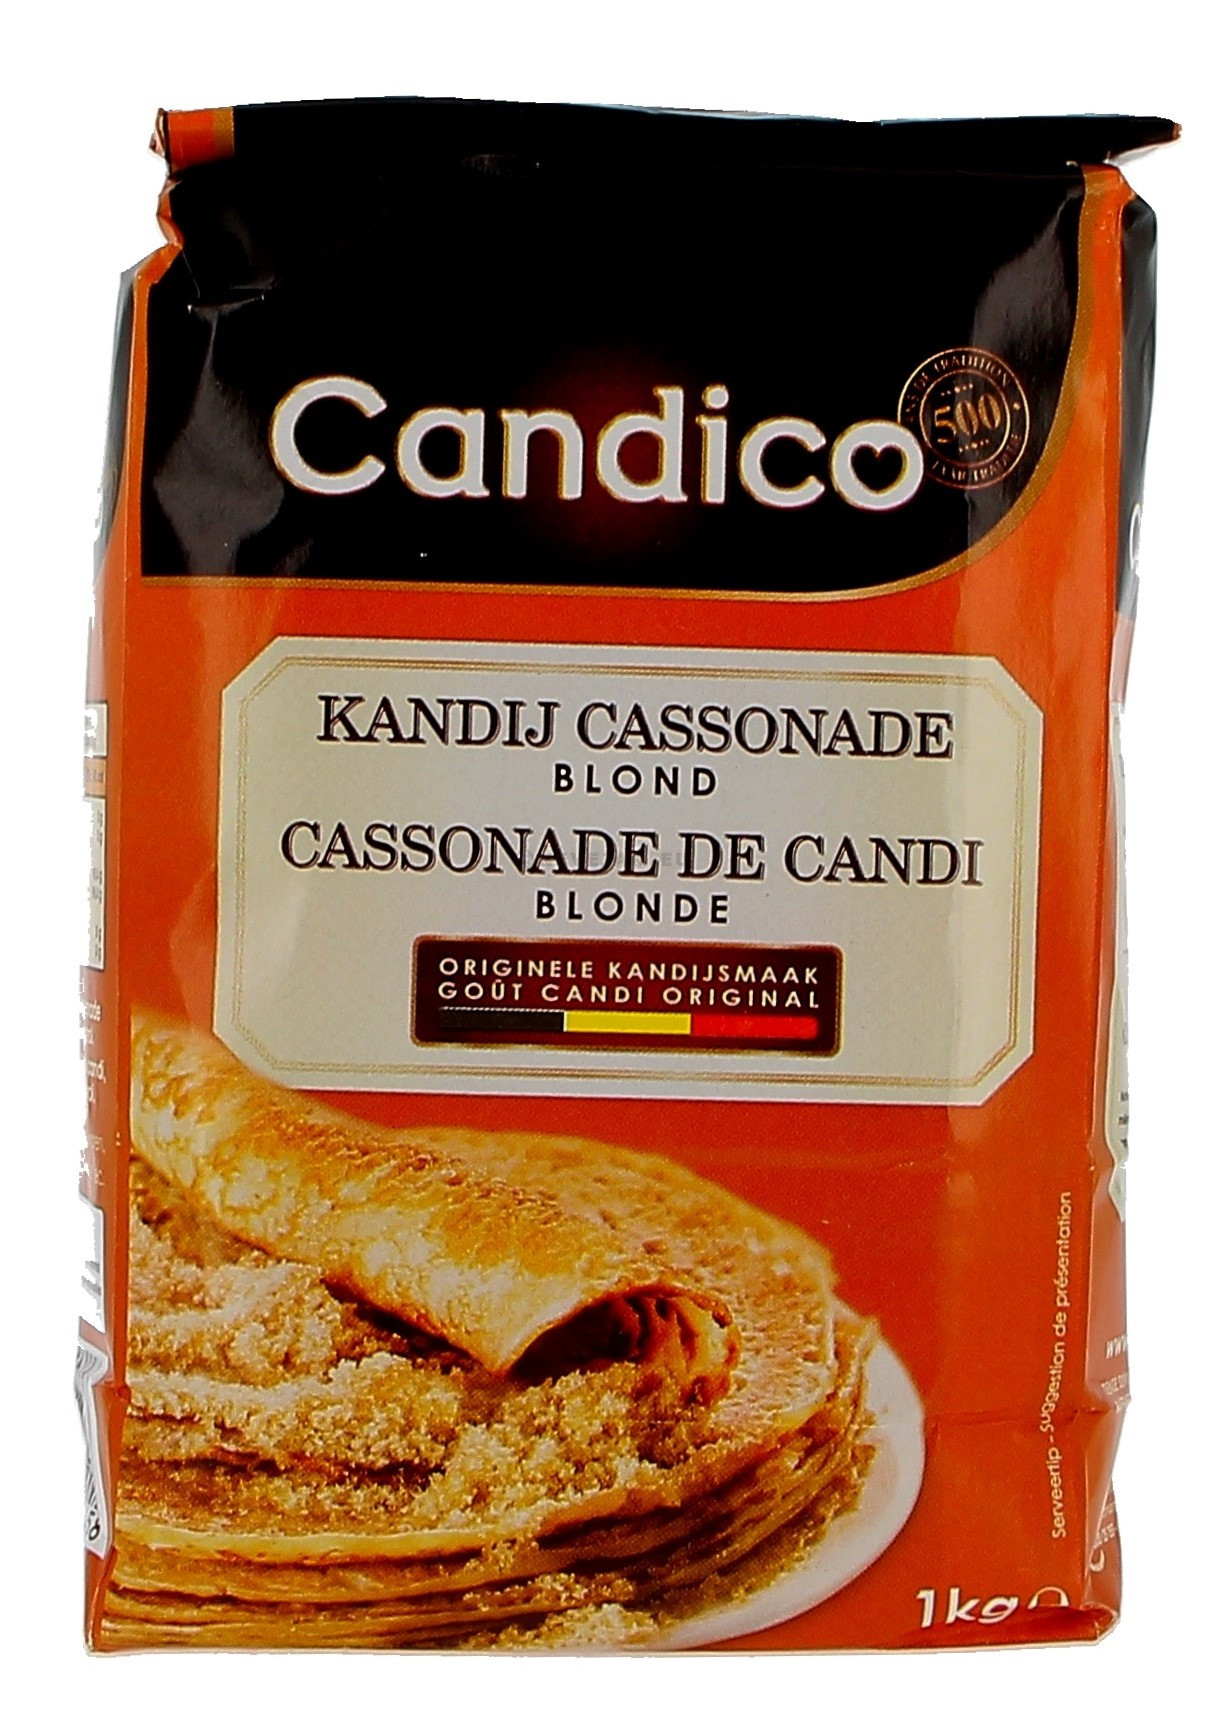 Cassonade de candi blonde 1kg Candico (Suiker)